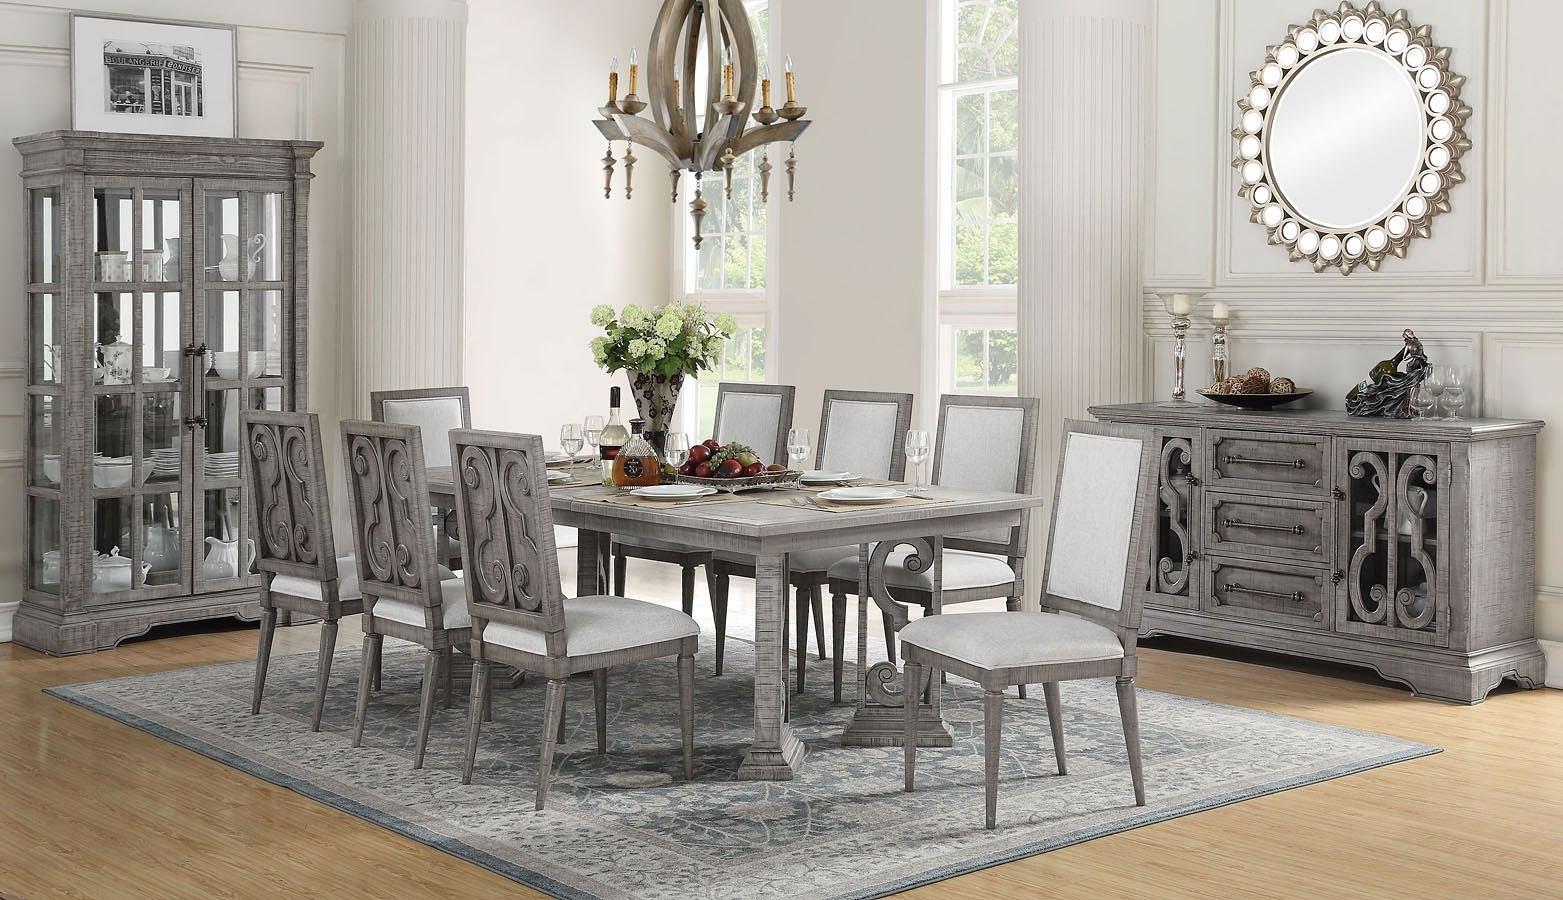 harden dining room furniture | Artesia Rectangular Dining Room Set Acme Furniture ...